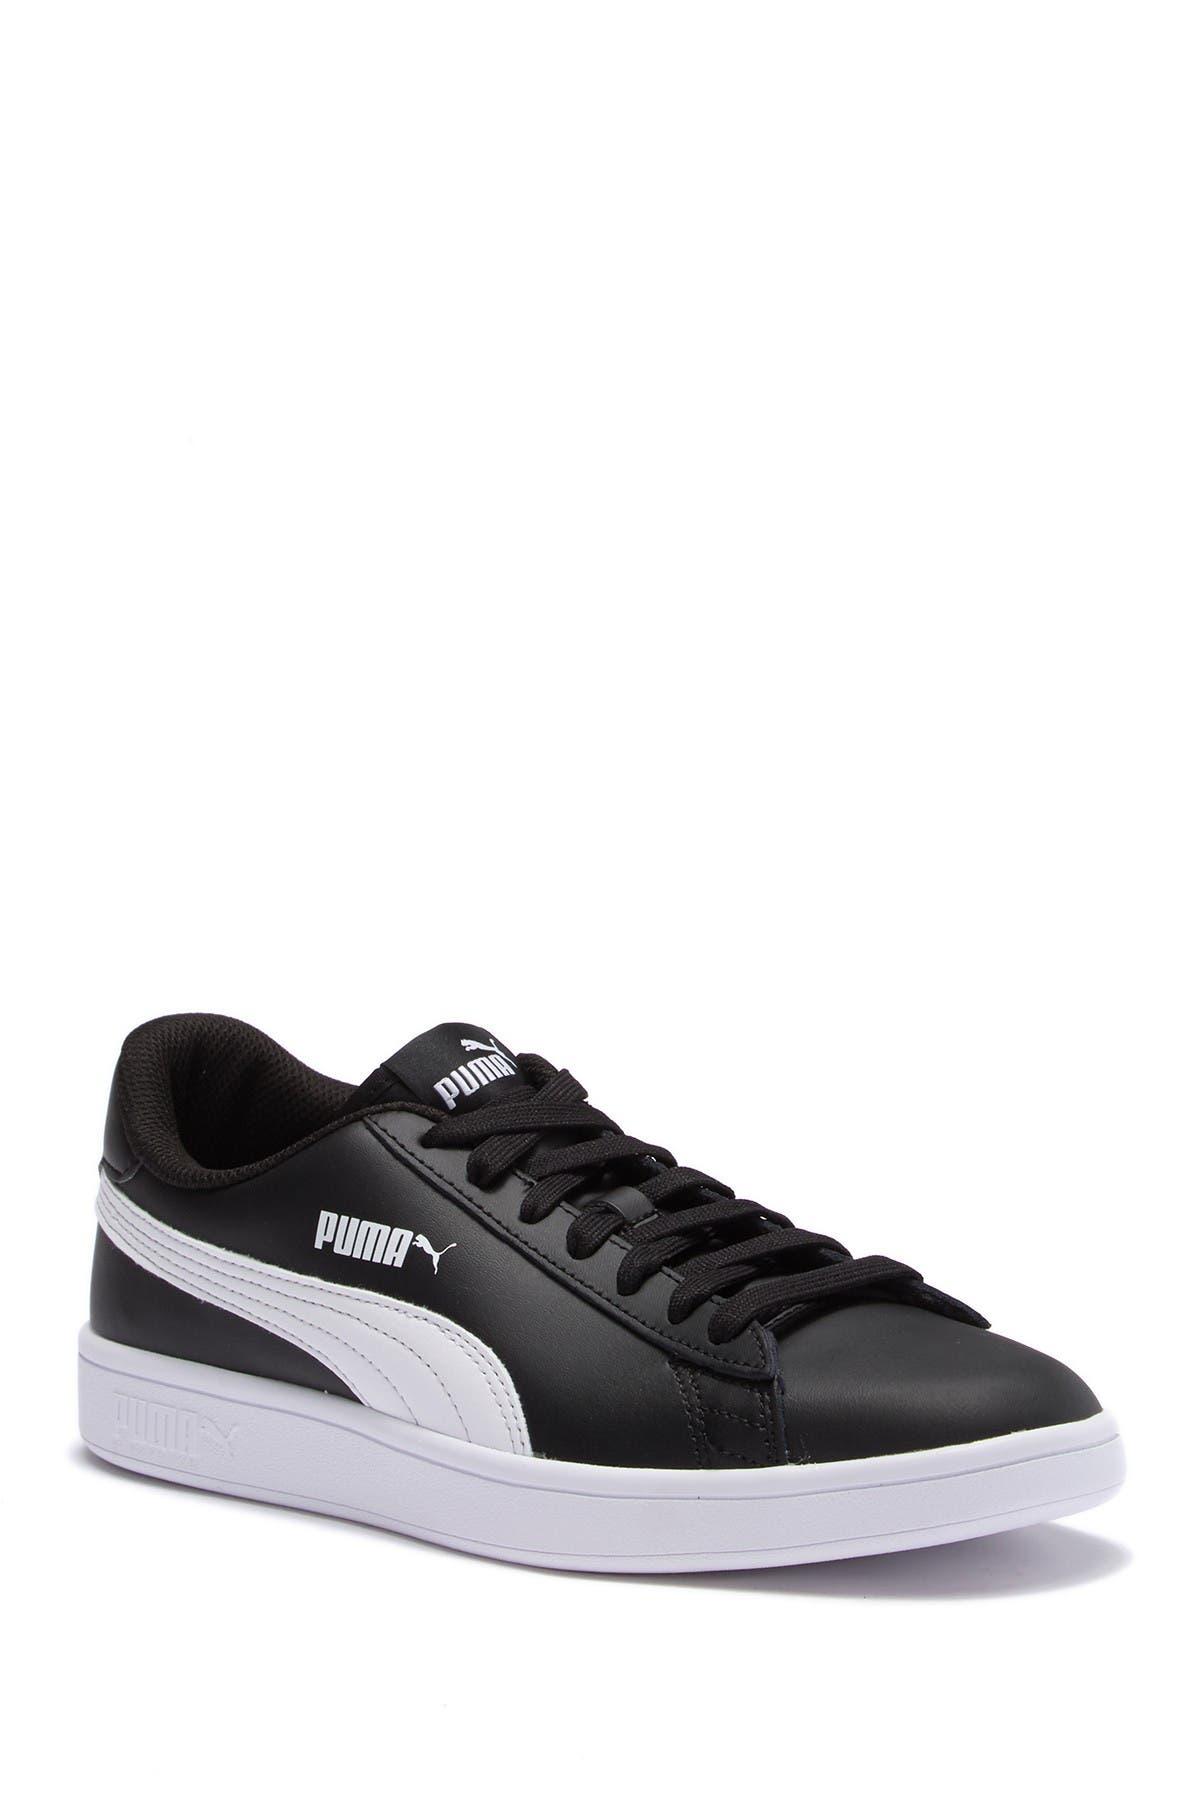 Image of PUMA Smash V2 Leather Sneaker